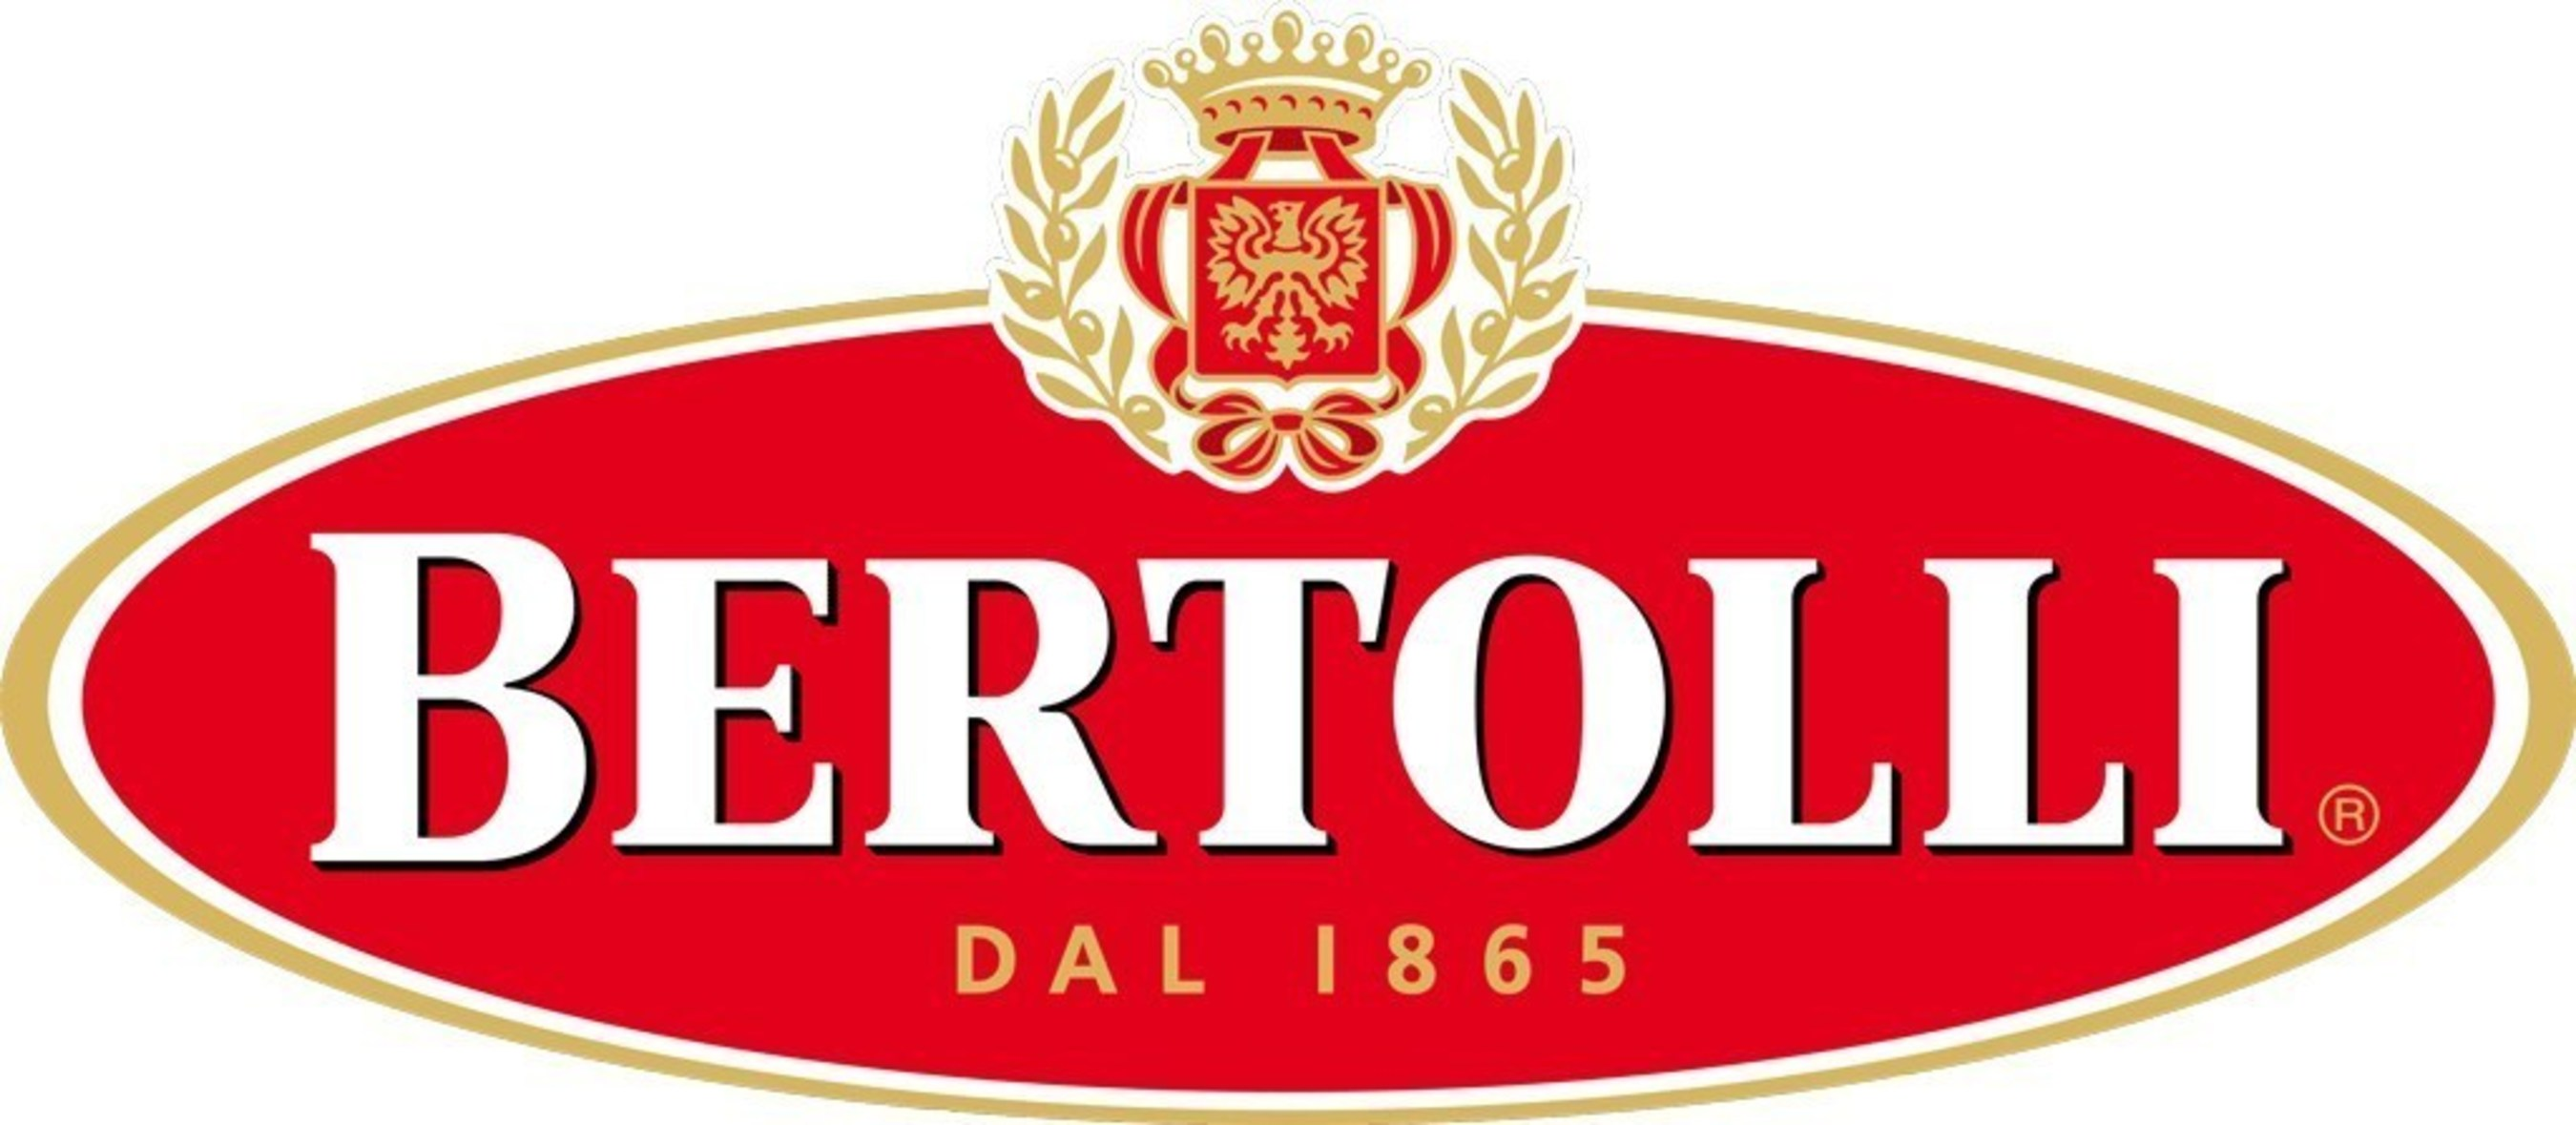 Bertolli(R) Studies How Italians And Americans Really Eat